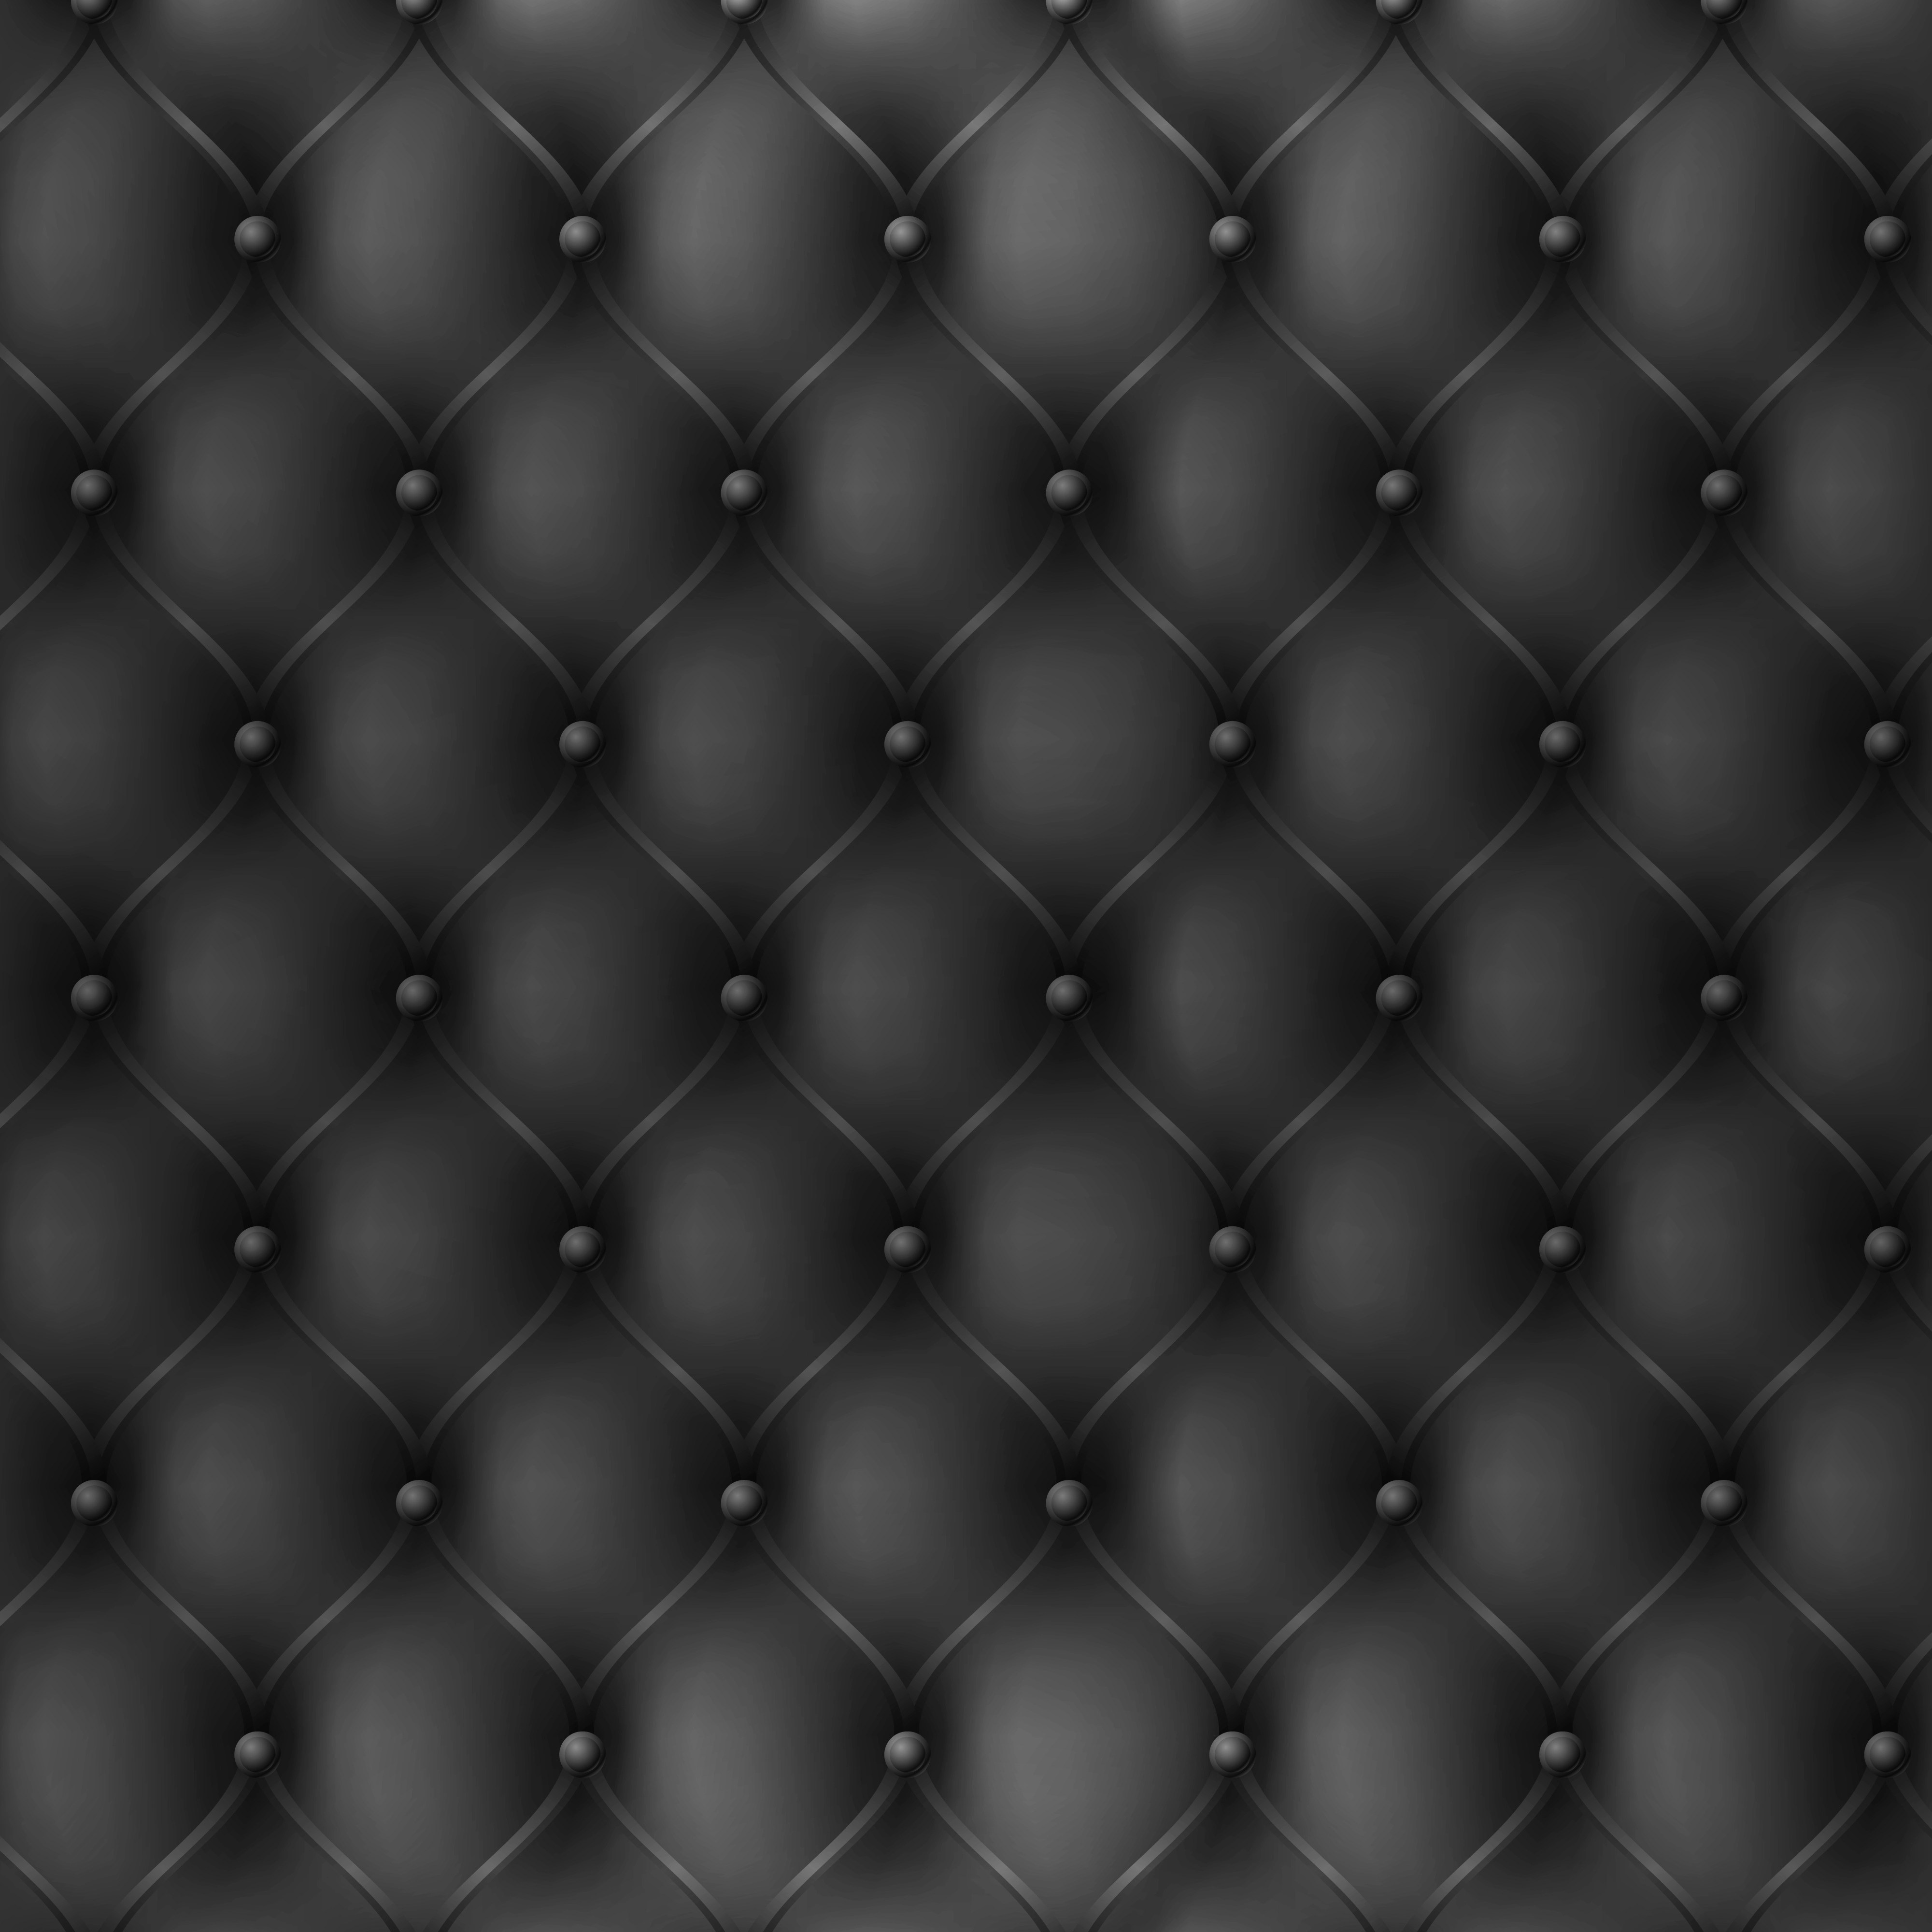 royal blue sofa fabric ventura texture free vector art - (11832 downloads)